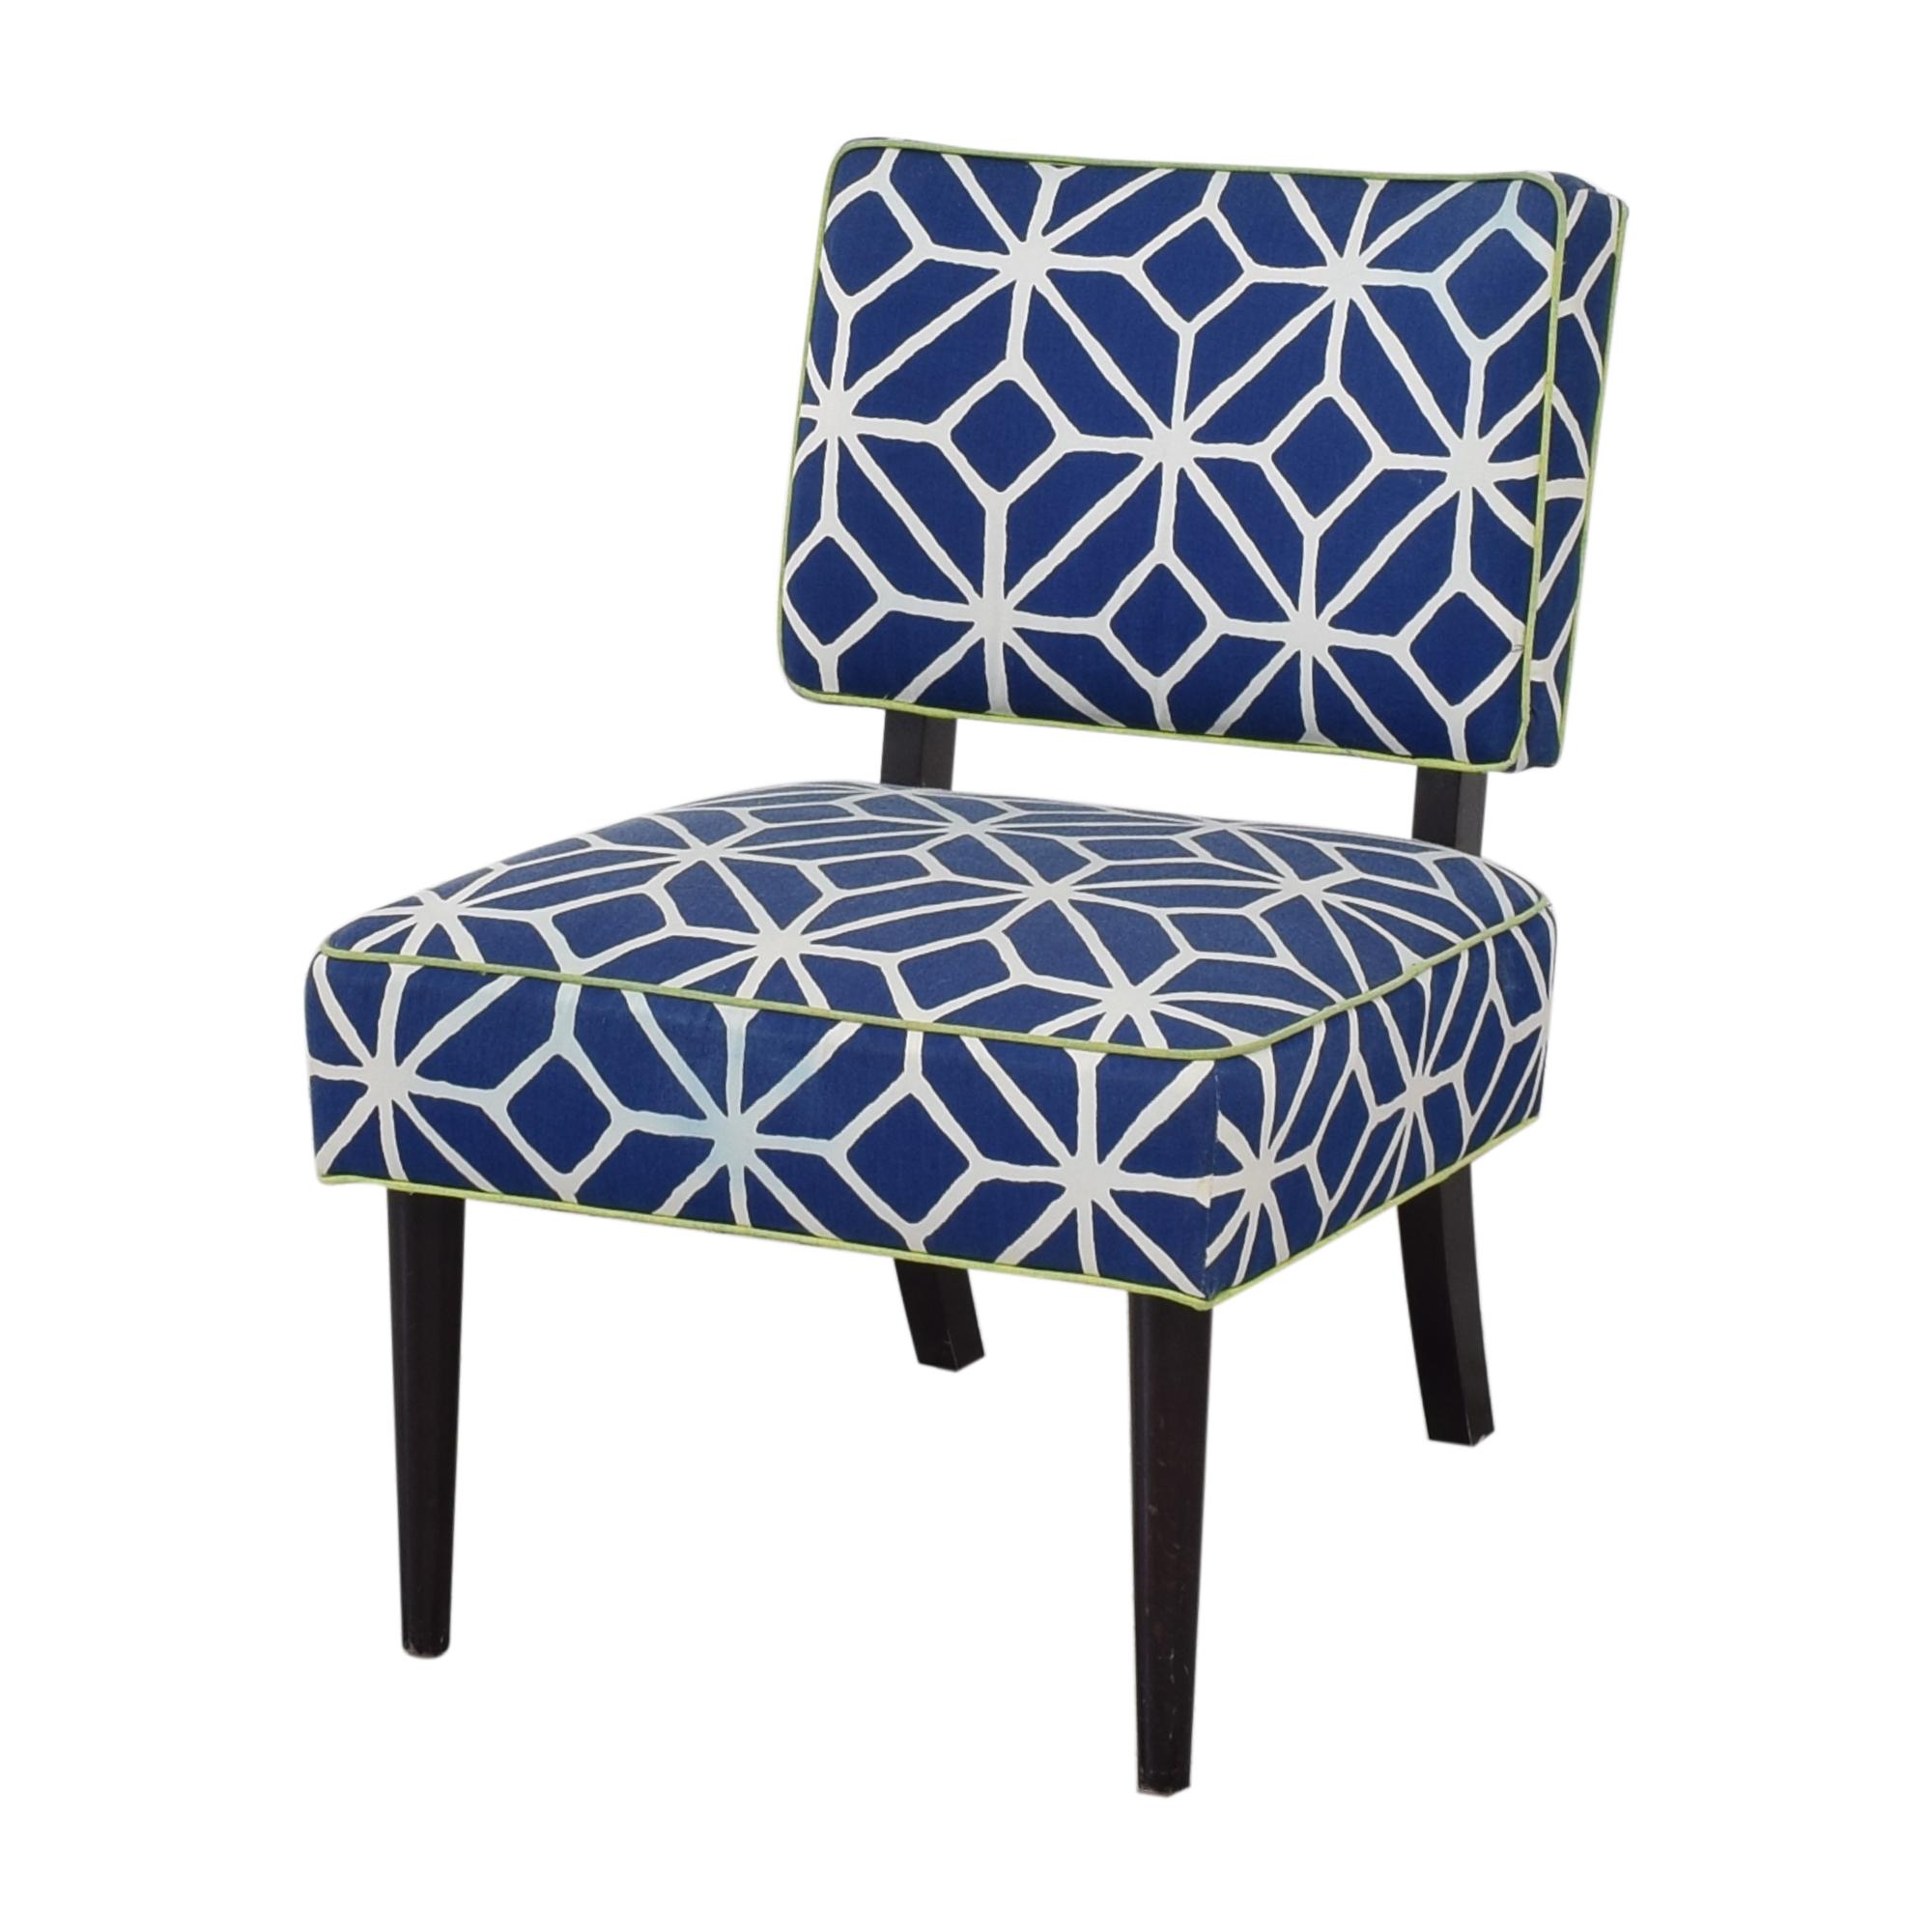 Room & Board Room & Board Accent Chair ma